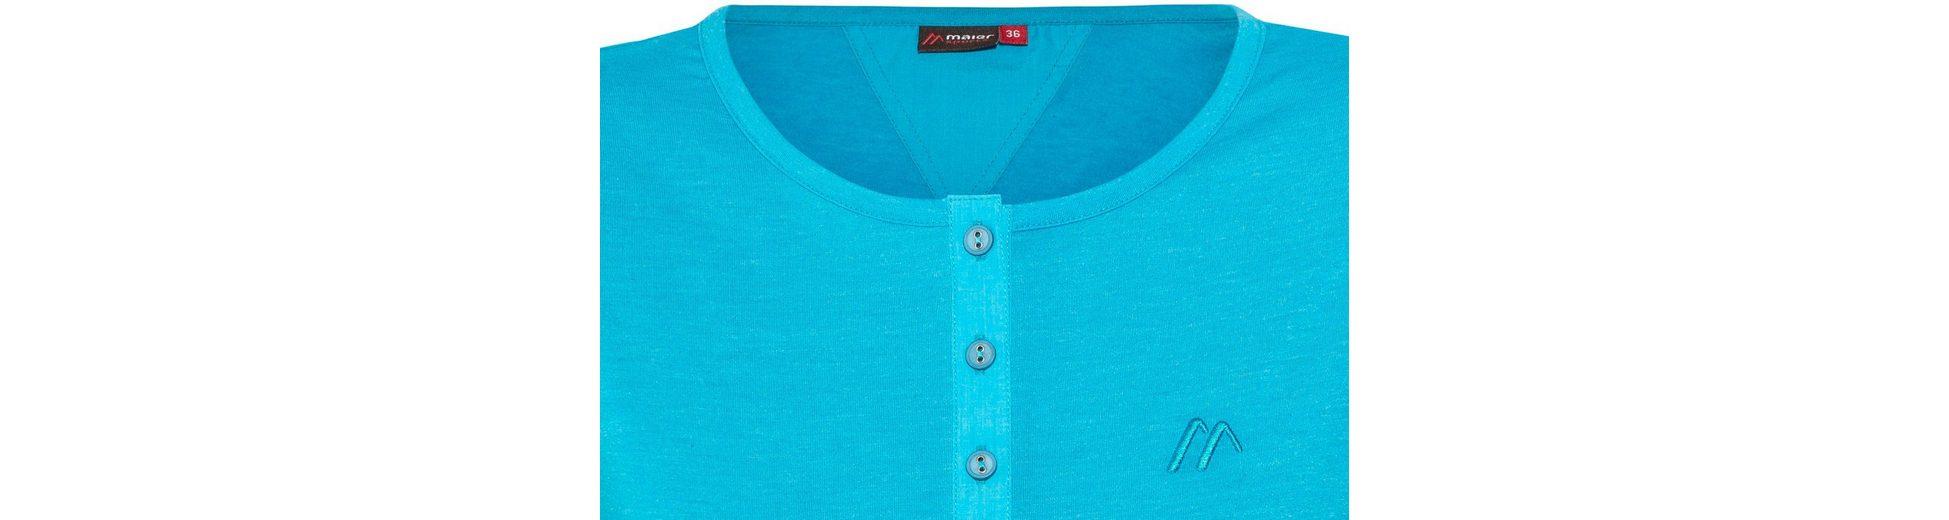 Maier Sports T-Shirt Clare T-Shirt Women Günstig Kaufen Billig 5Qh3UcLq